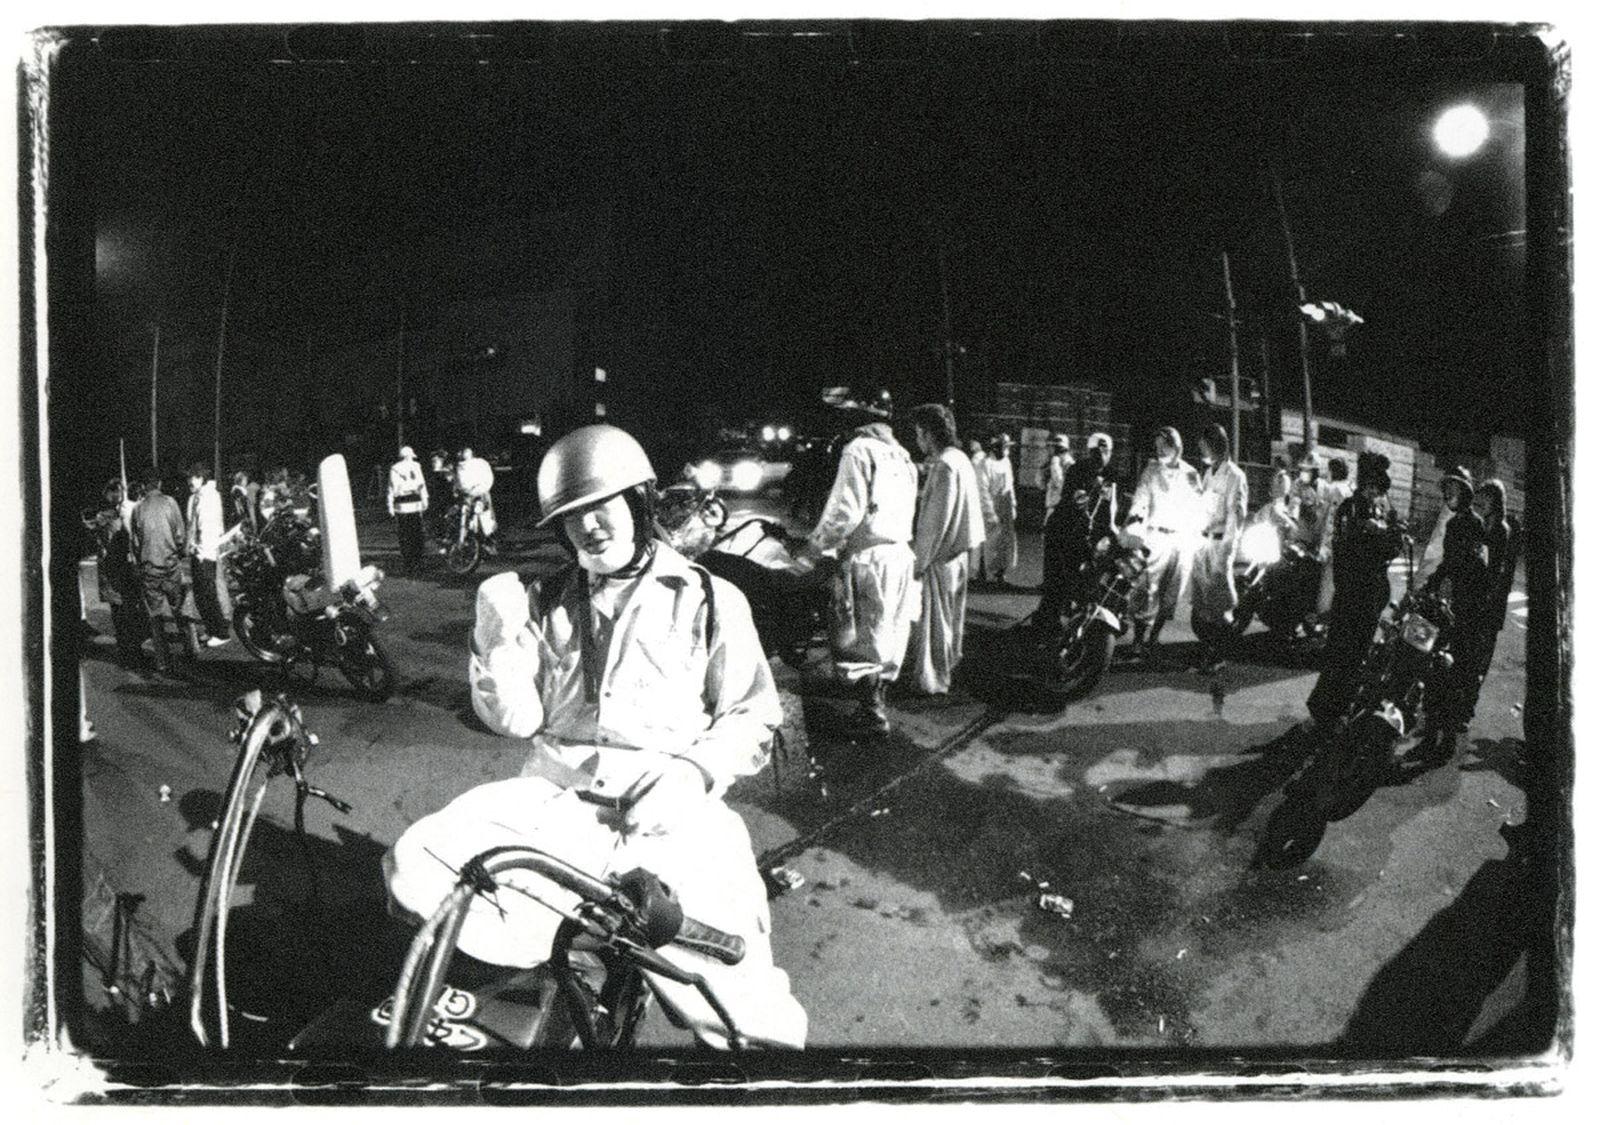 bosozoku-the-stylish-legacy-of-japans-rebel-motorcycle-gangs-12